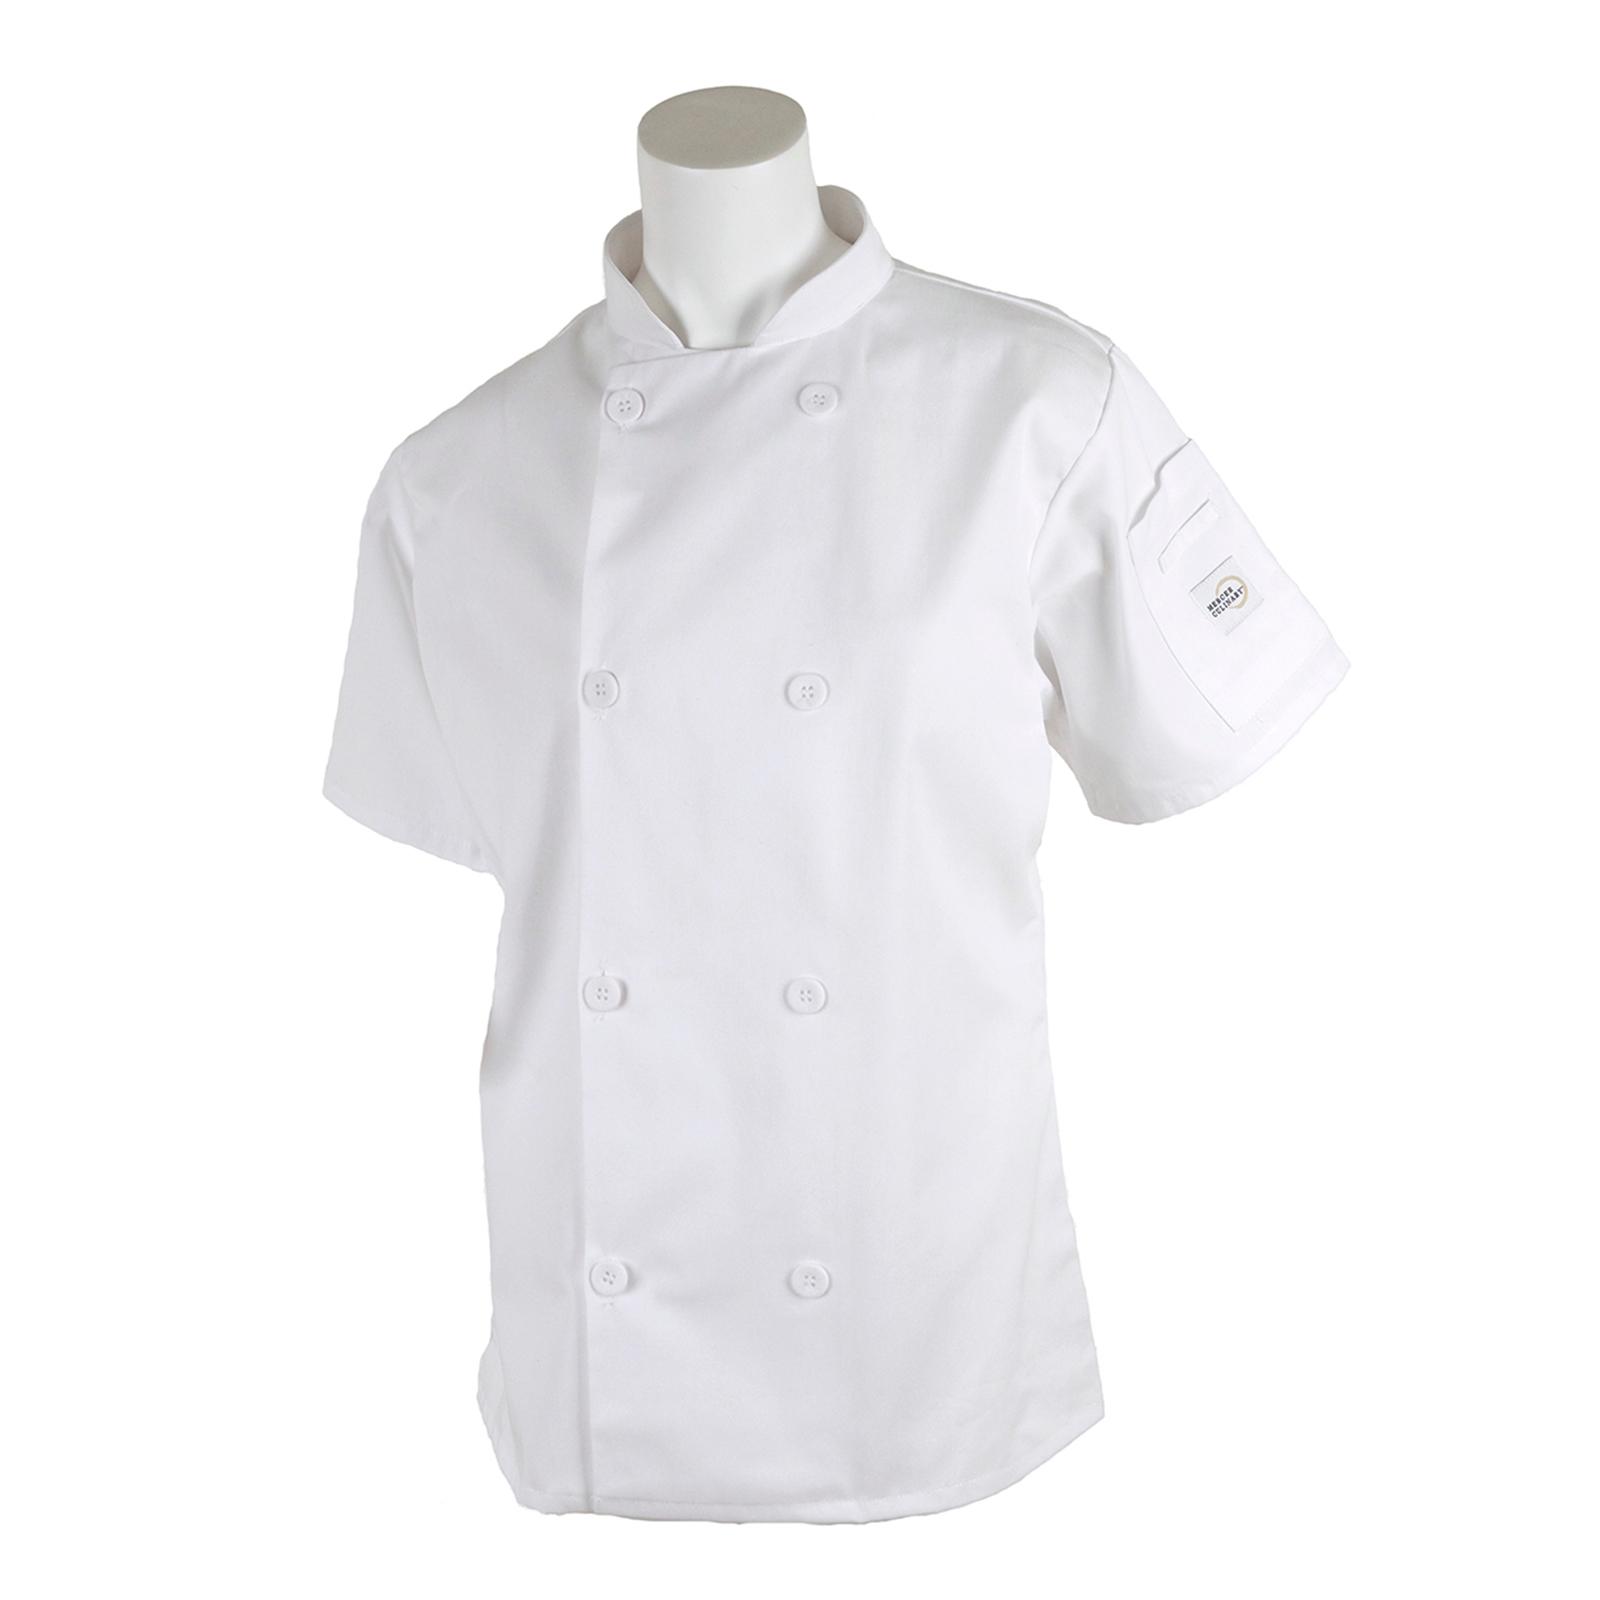 Mercer Culinary M60023WH3X chef's coat